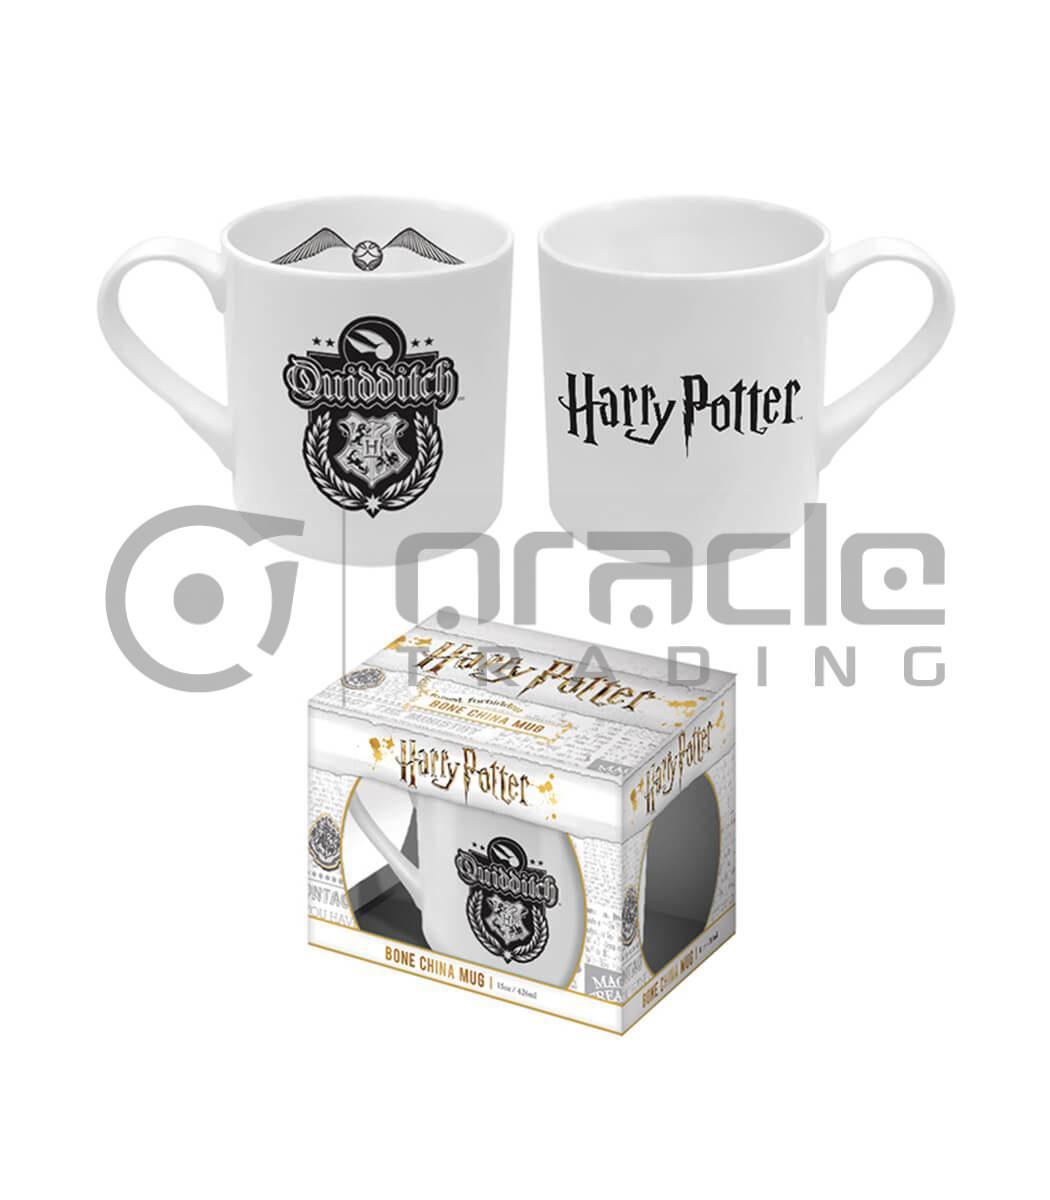 Harry Potter Bone China Mug - Quidditch